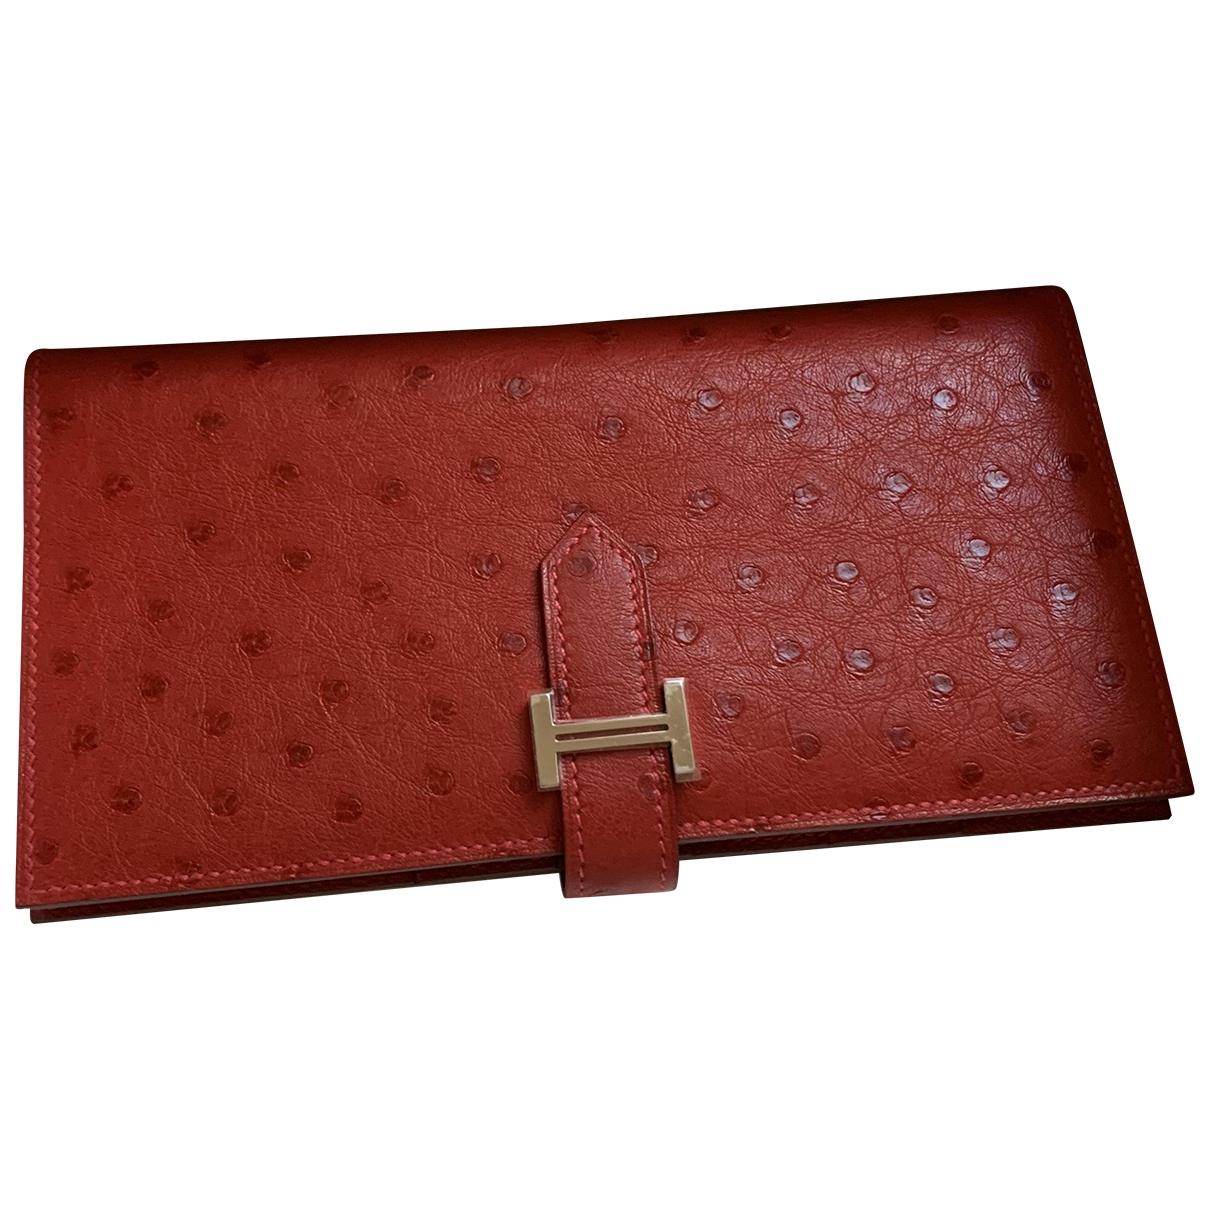 Hermes Bearn Portemonnaie in  Rot Vogelstrauss